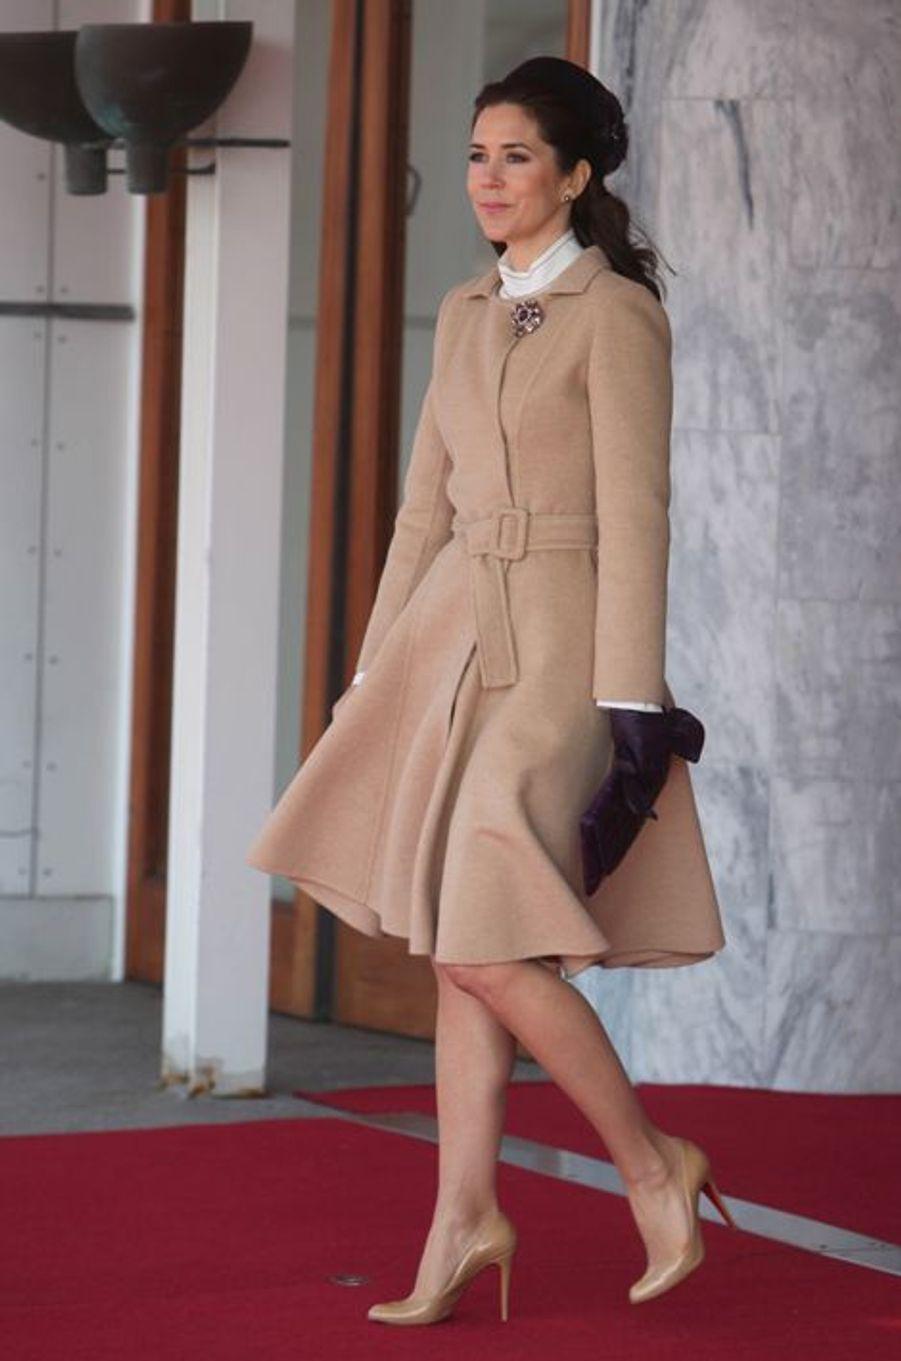 La princesse Mary de Danemark, le 17 mars 2015